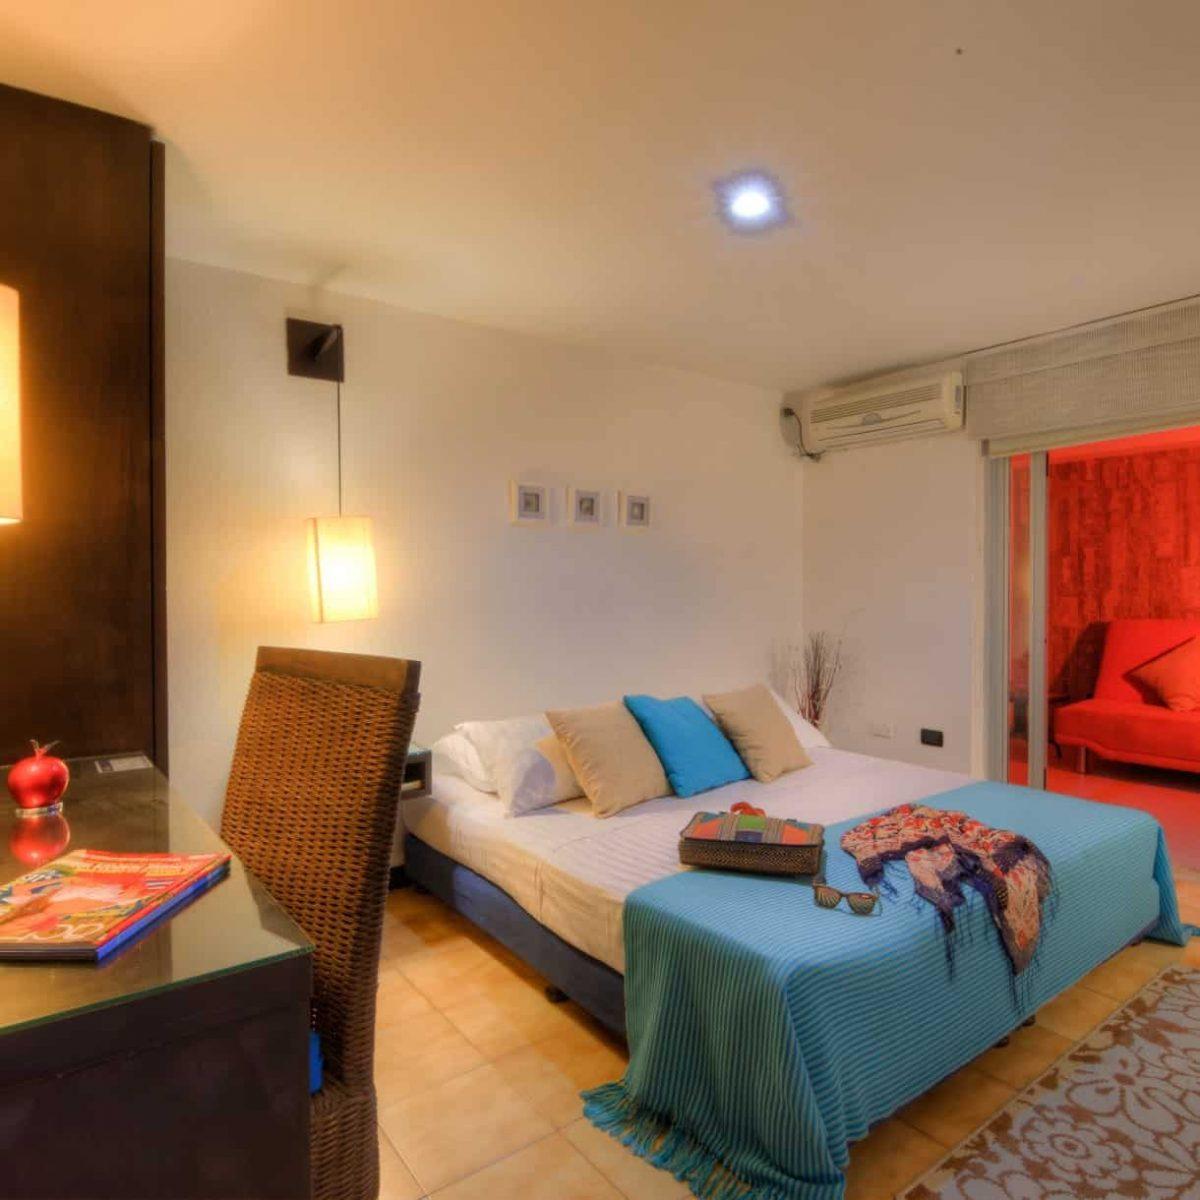 Oferta Santa Marta: Hotel Santorini Hotel Resort Desde $219.339 COP